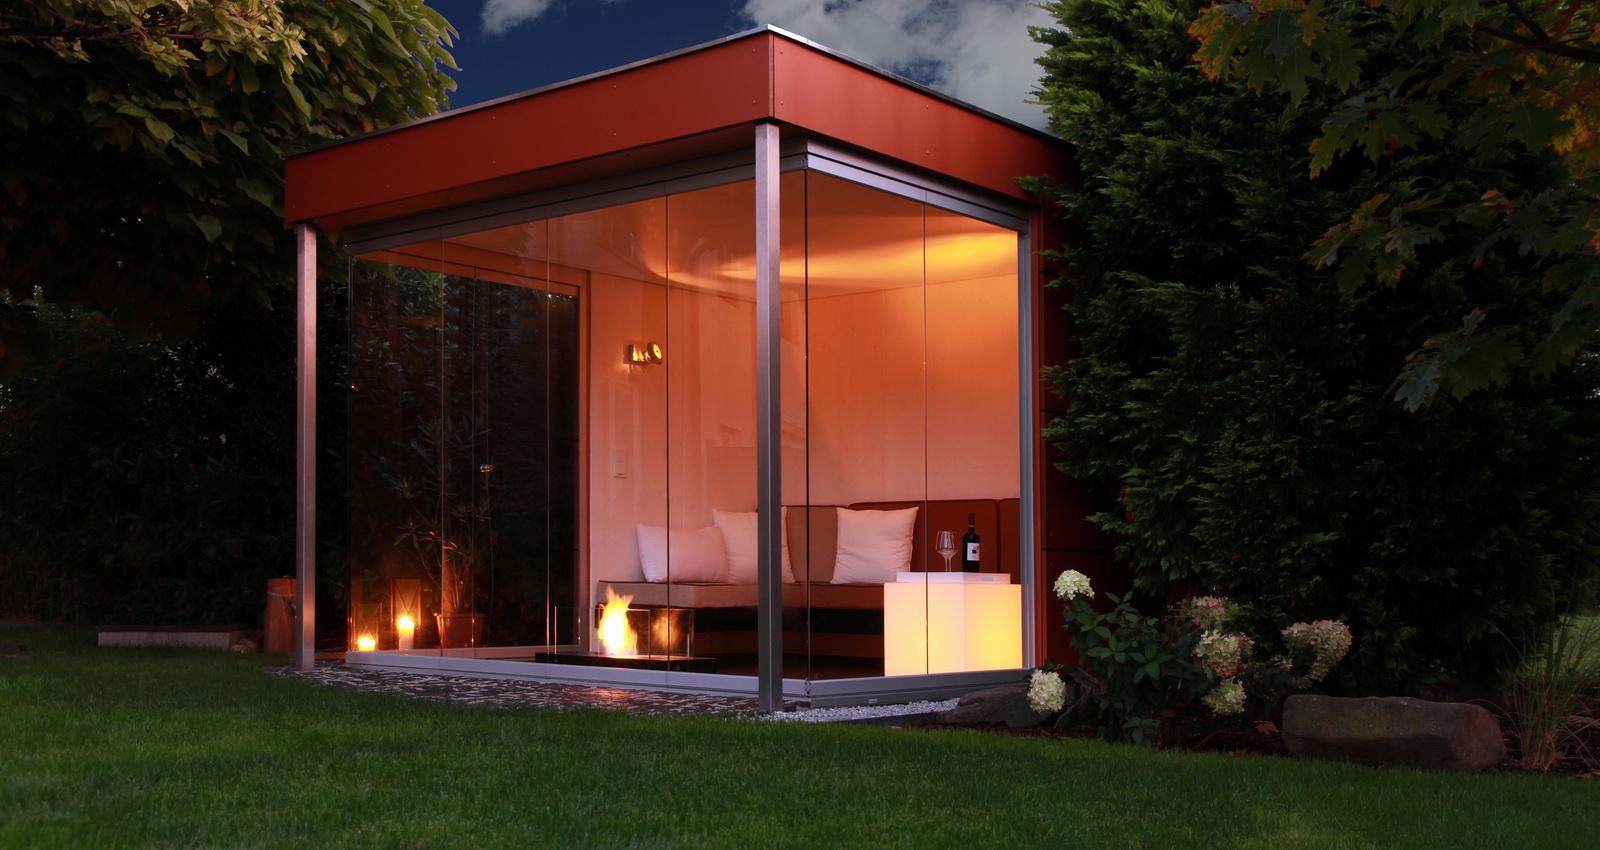 design gartenhaus moderne gartenh user schicke gartensauna. Black Bedroom Furniture Sets. Home Design Ideas